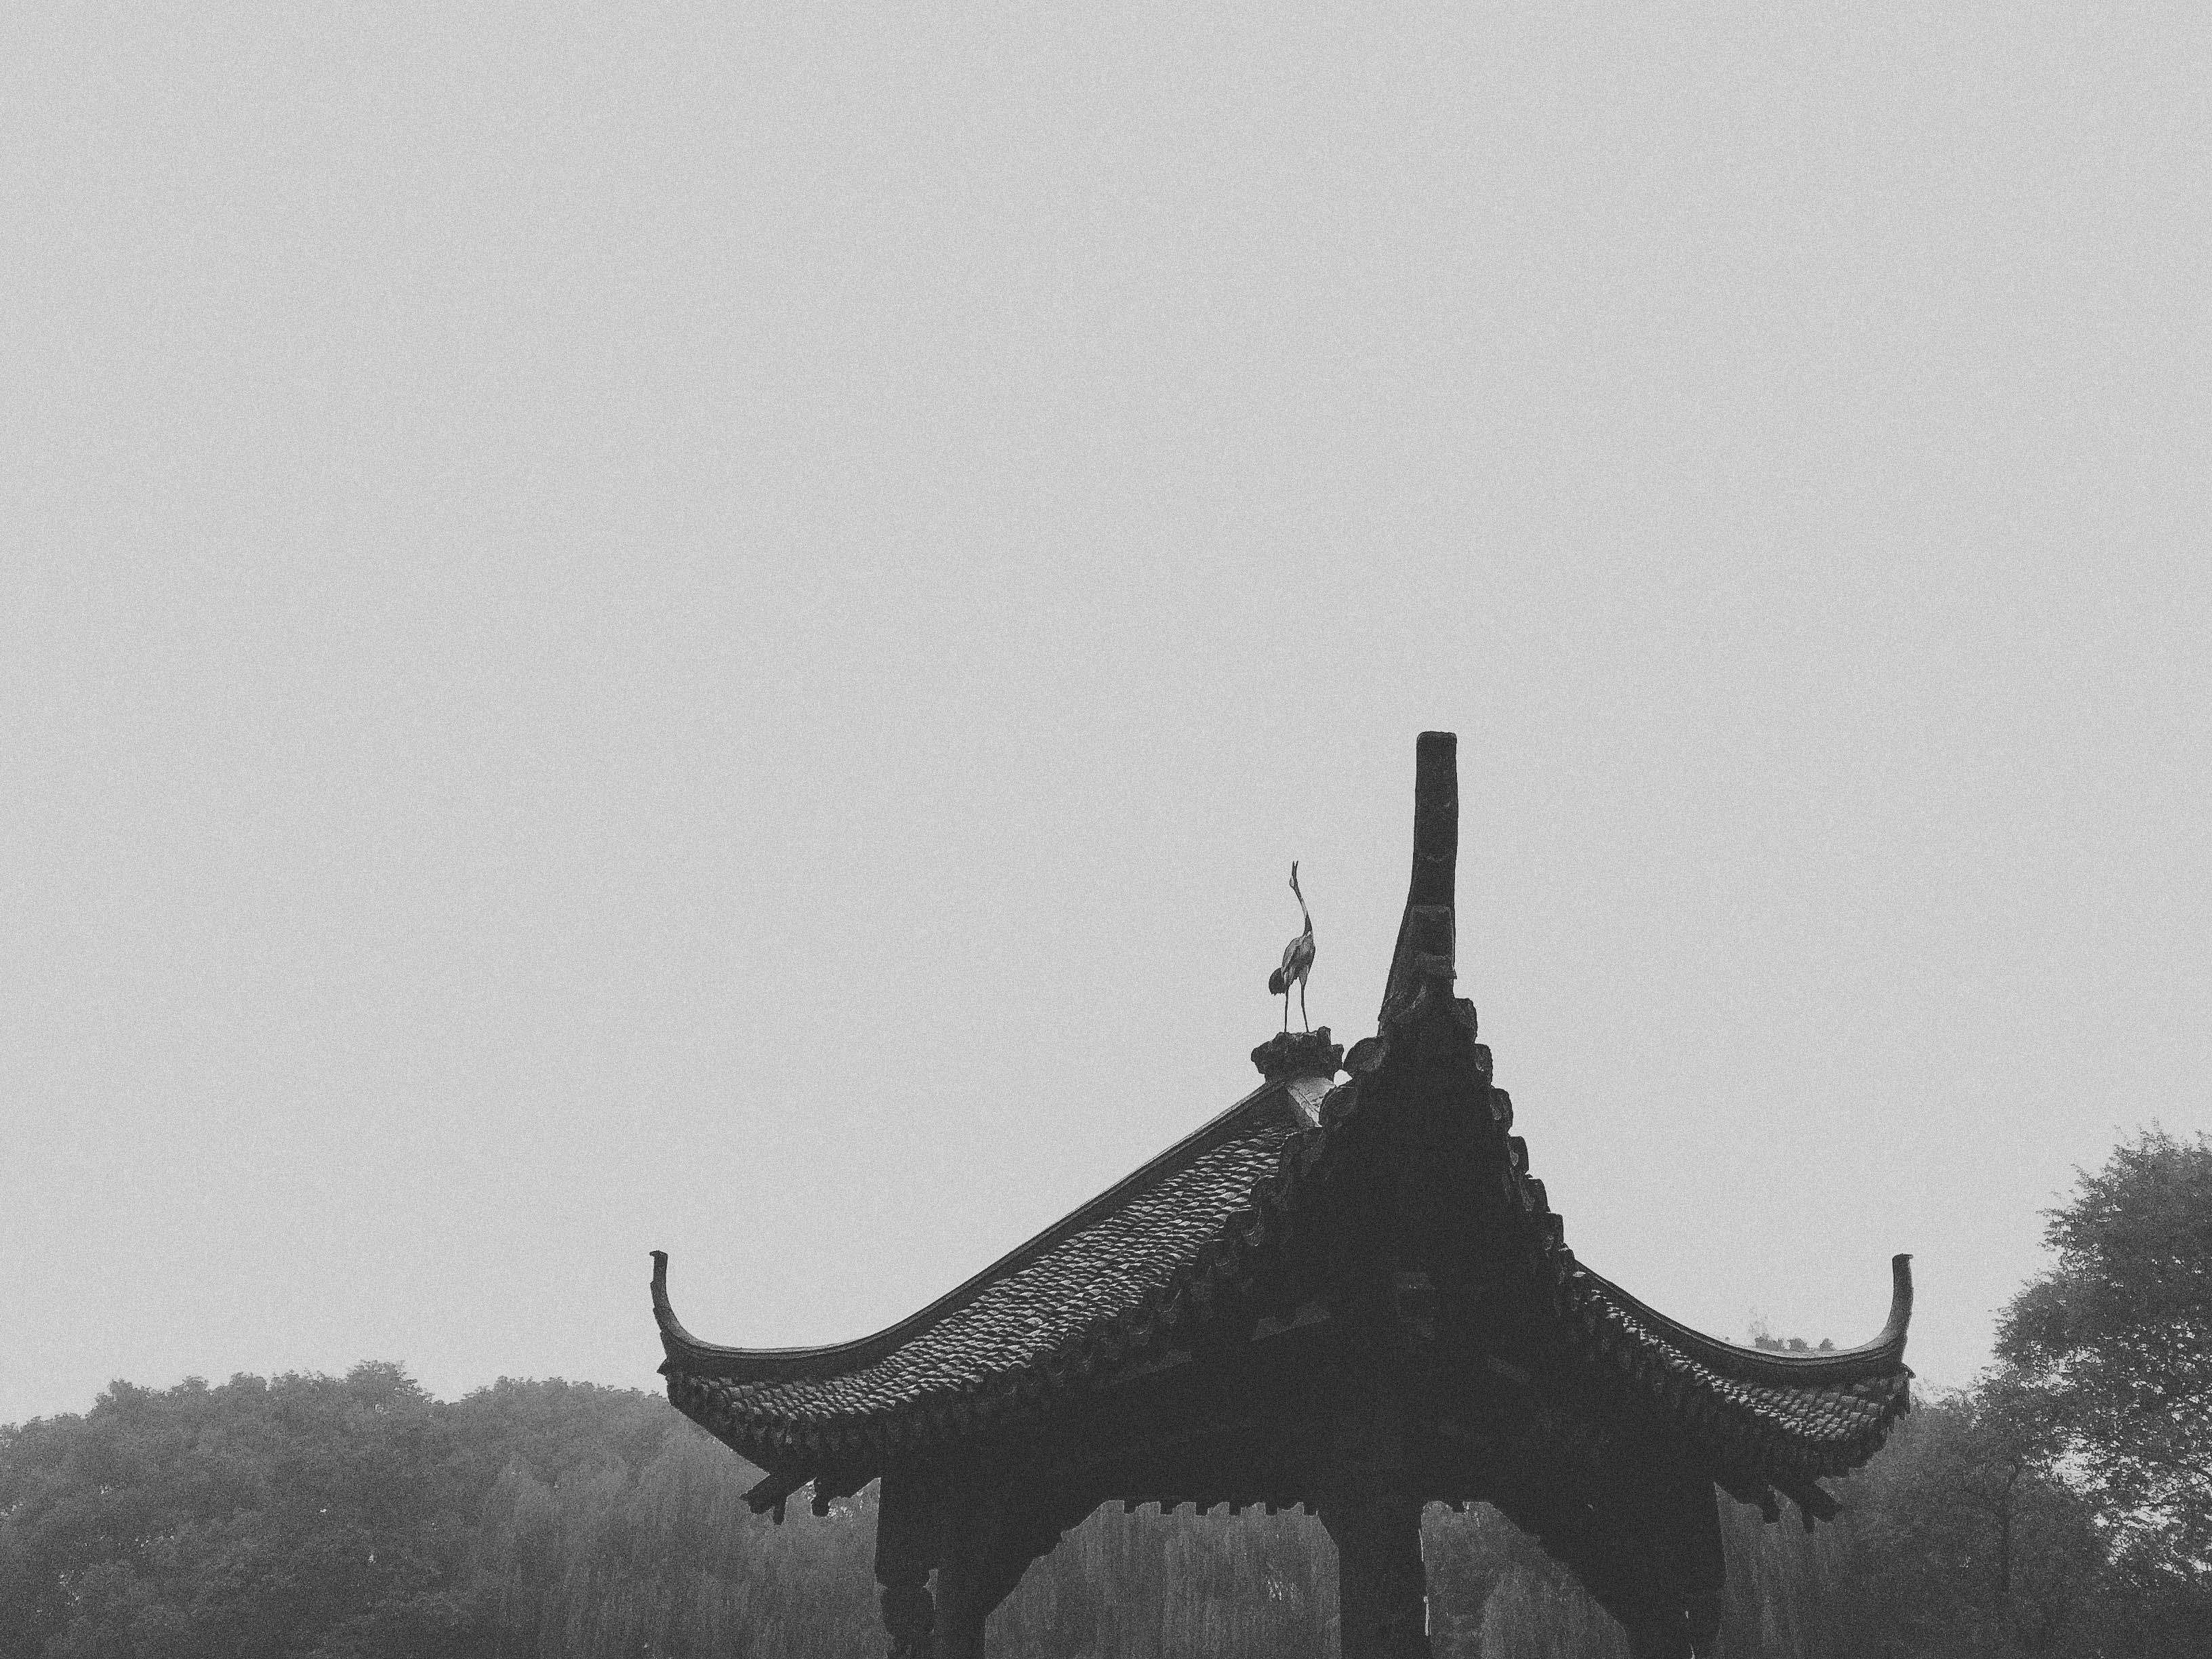 Free stock photo of architecture, black, black and white, black white